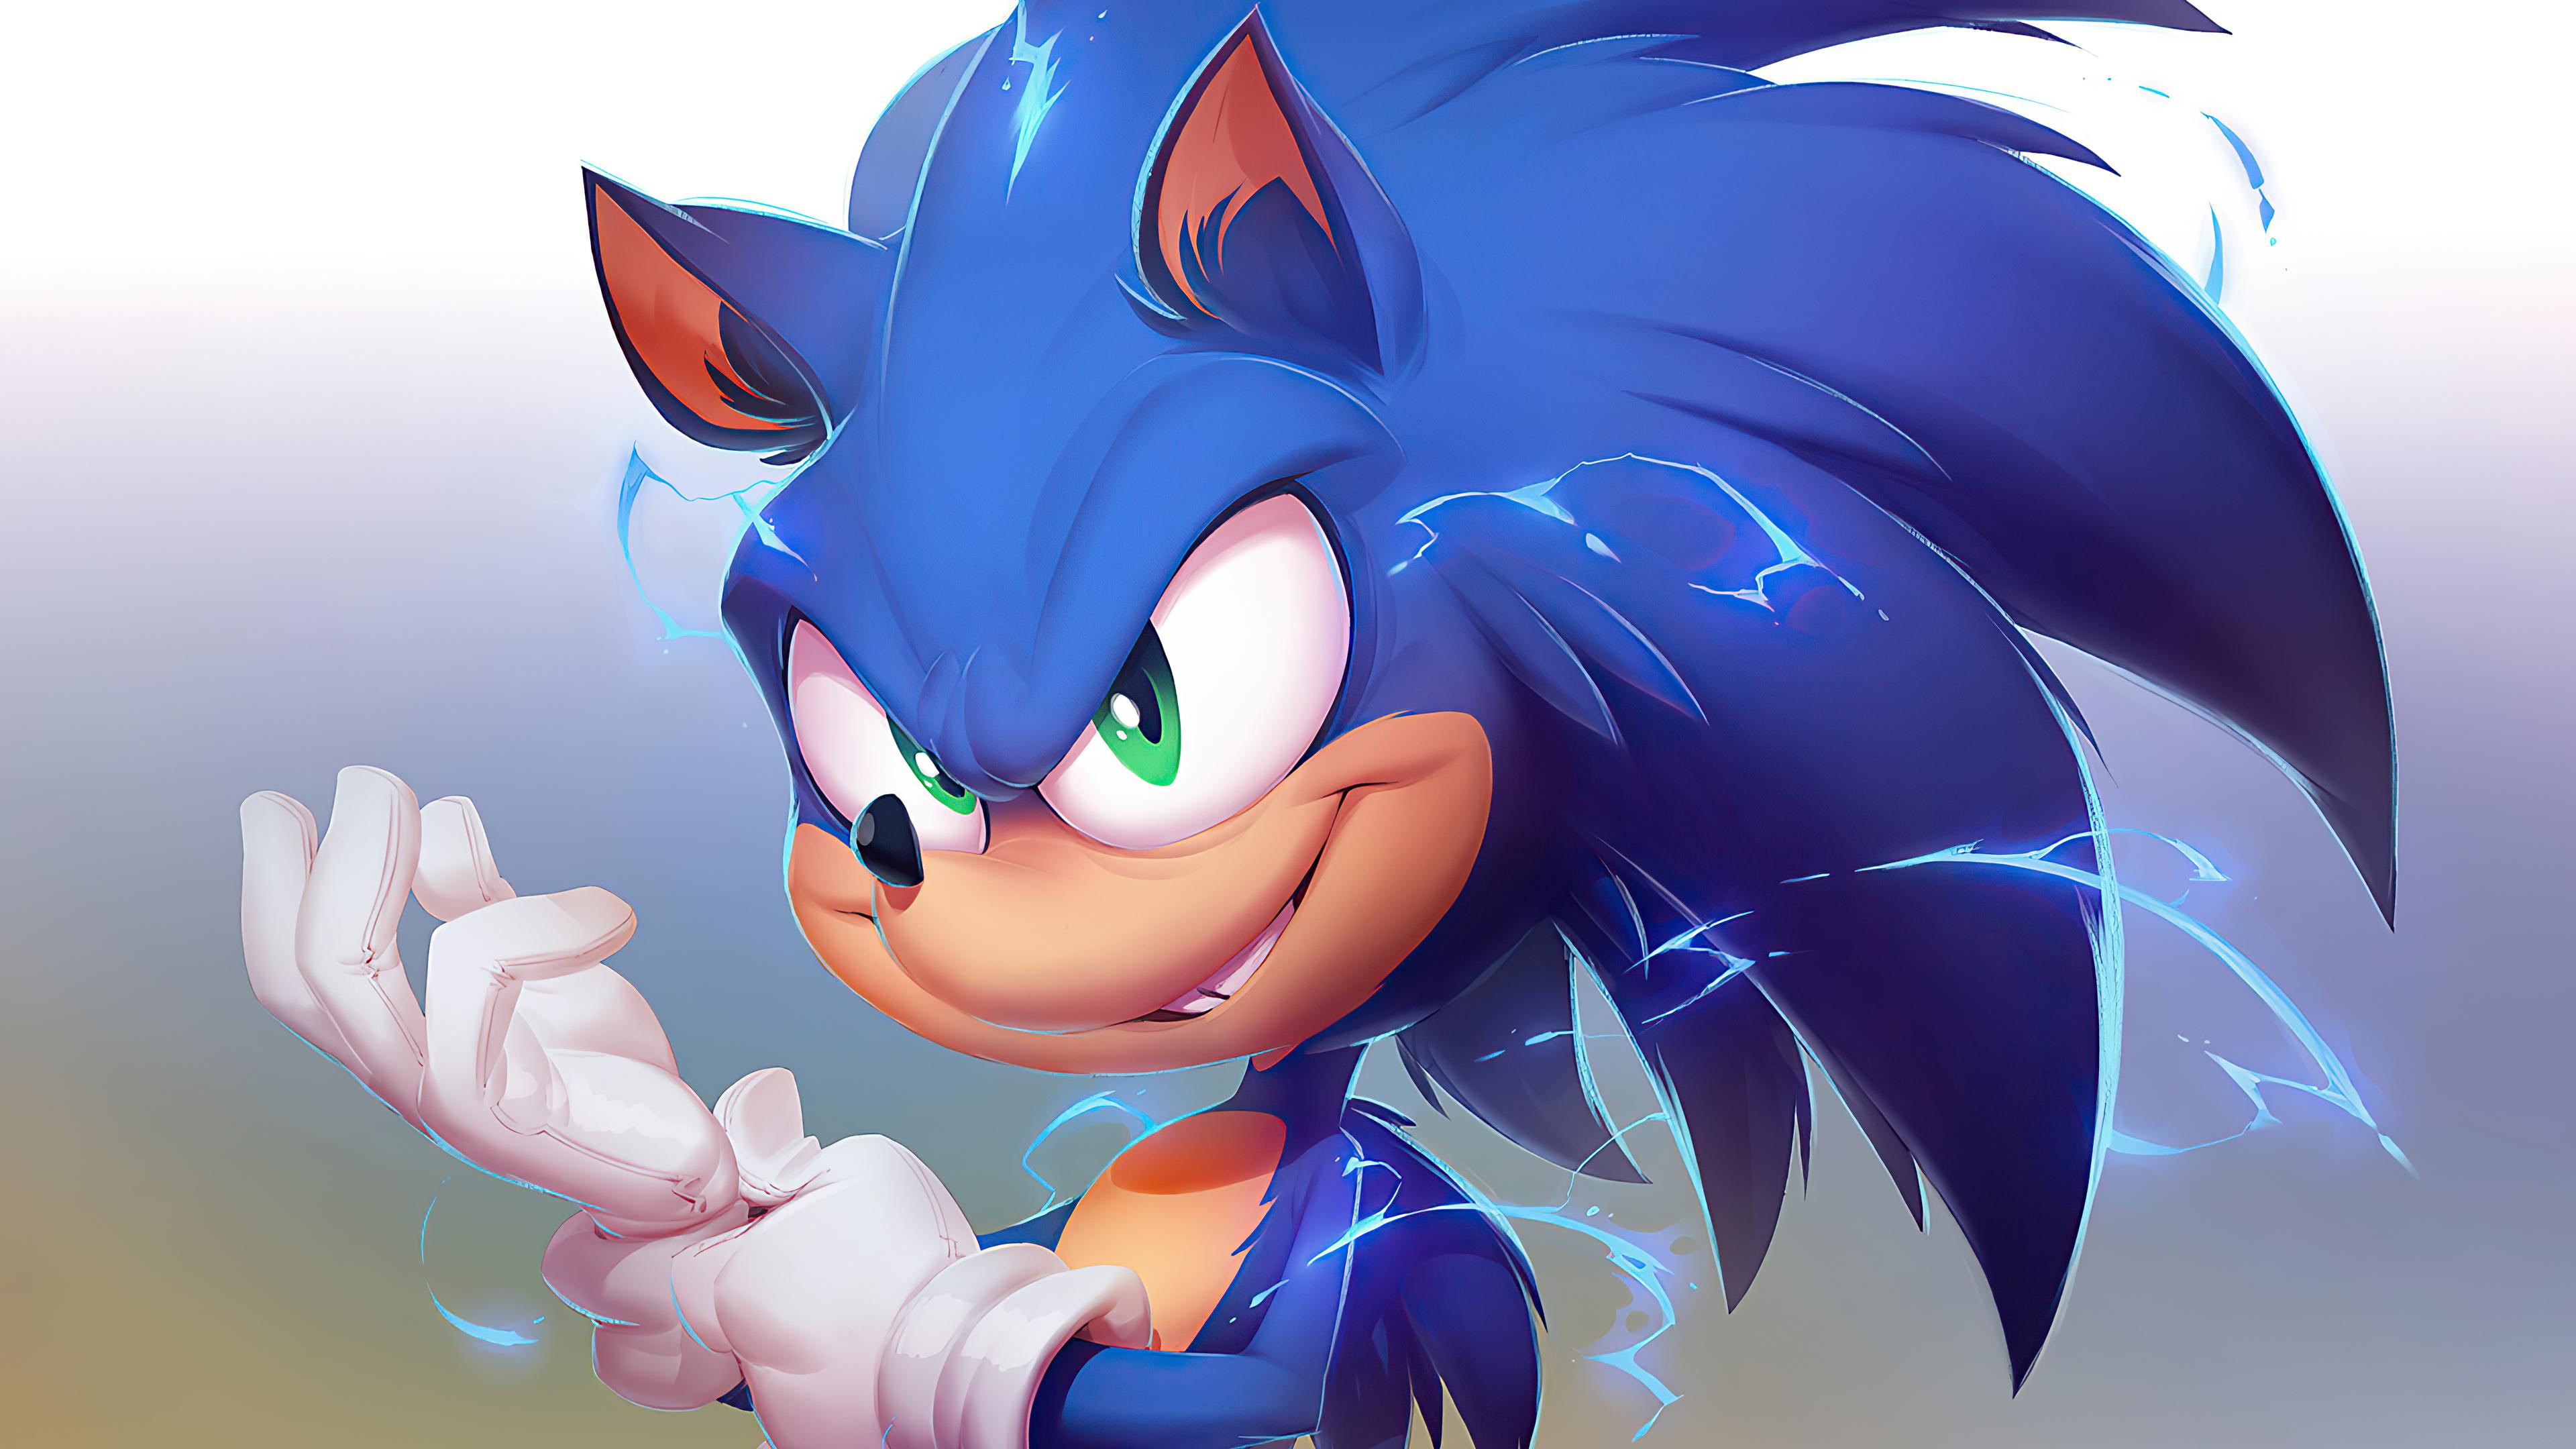 Sonic The Hedgehog 2020 4k Artwork Hd Movies 4k Wallpapers